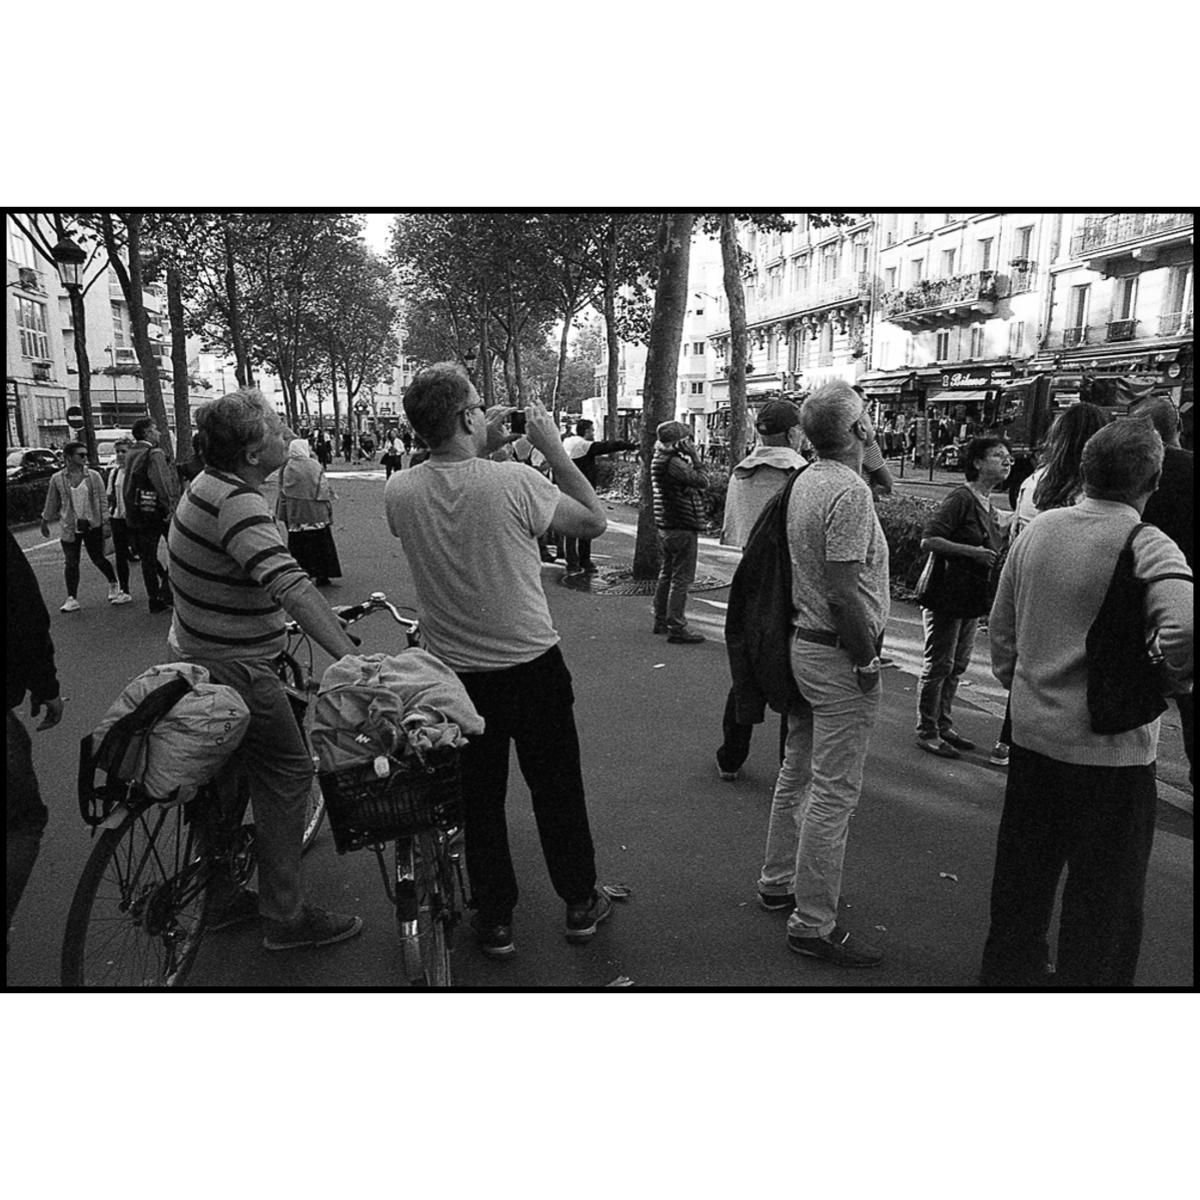 paris file-018.jpg